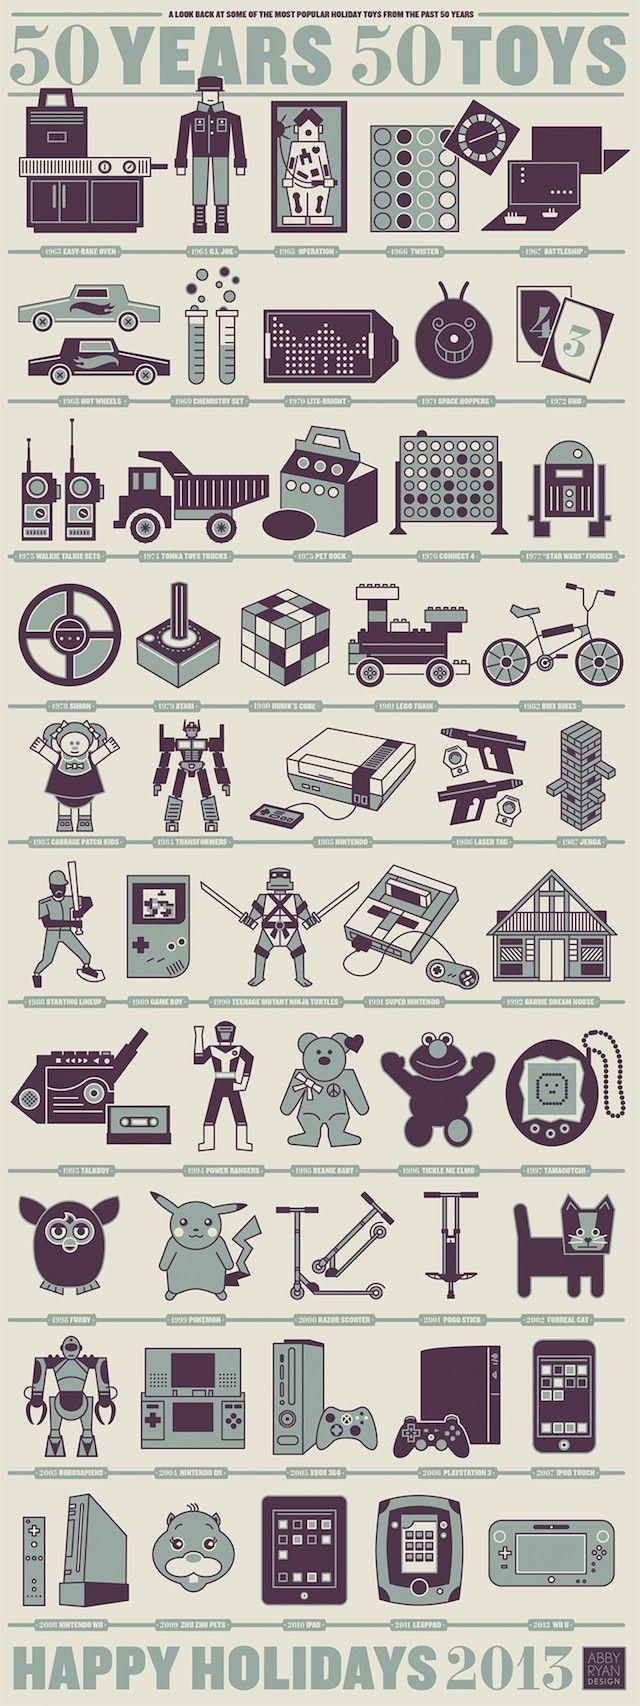 Toys for chrismas since 1950